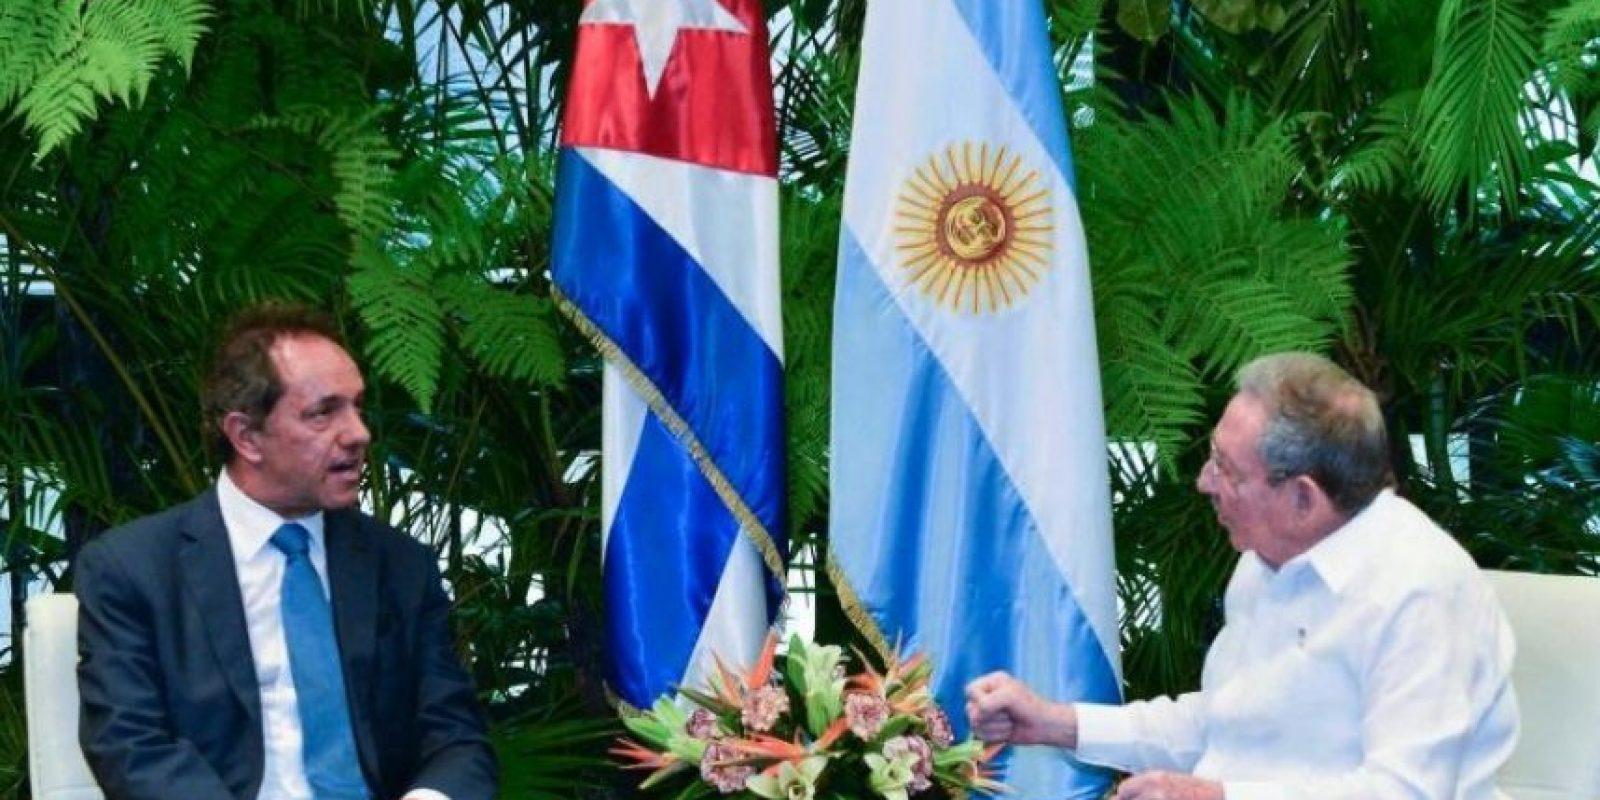 Gobernador de la provincia de Buenos Aires Foto:Facebook.com/danielsciolioficial